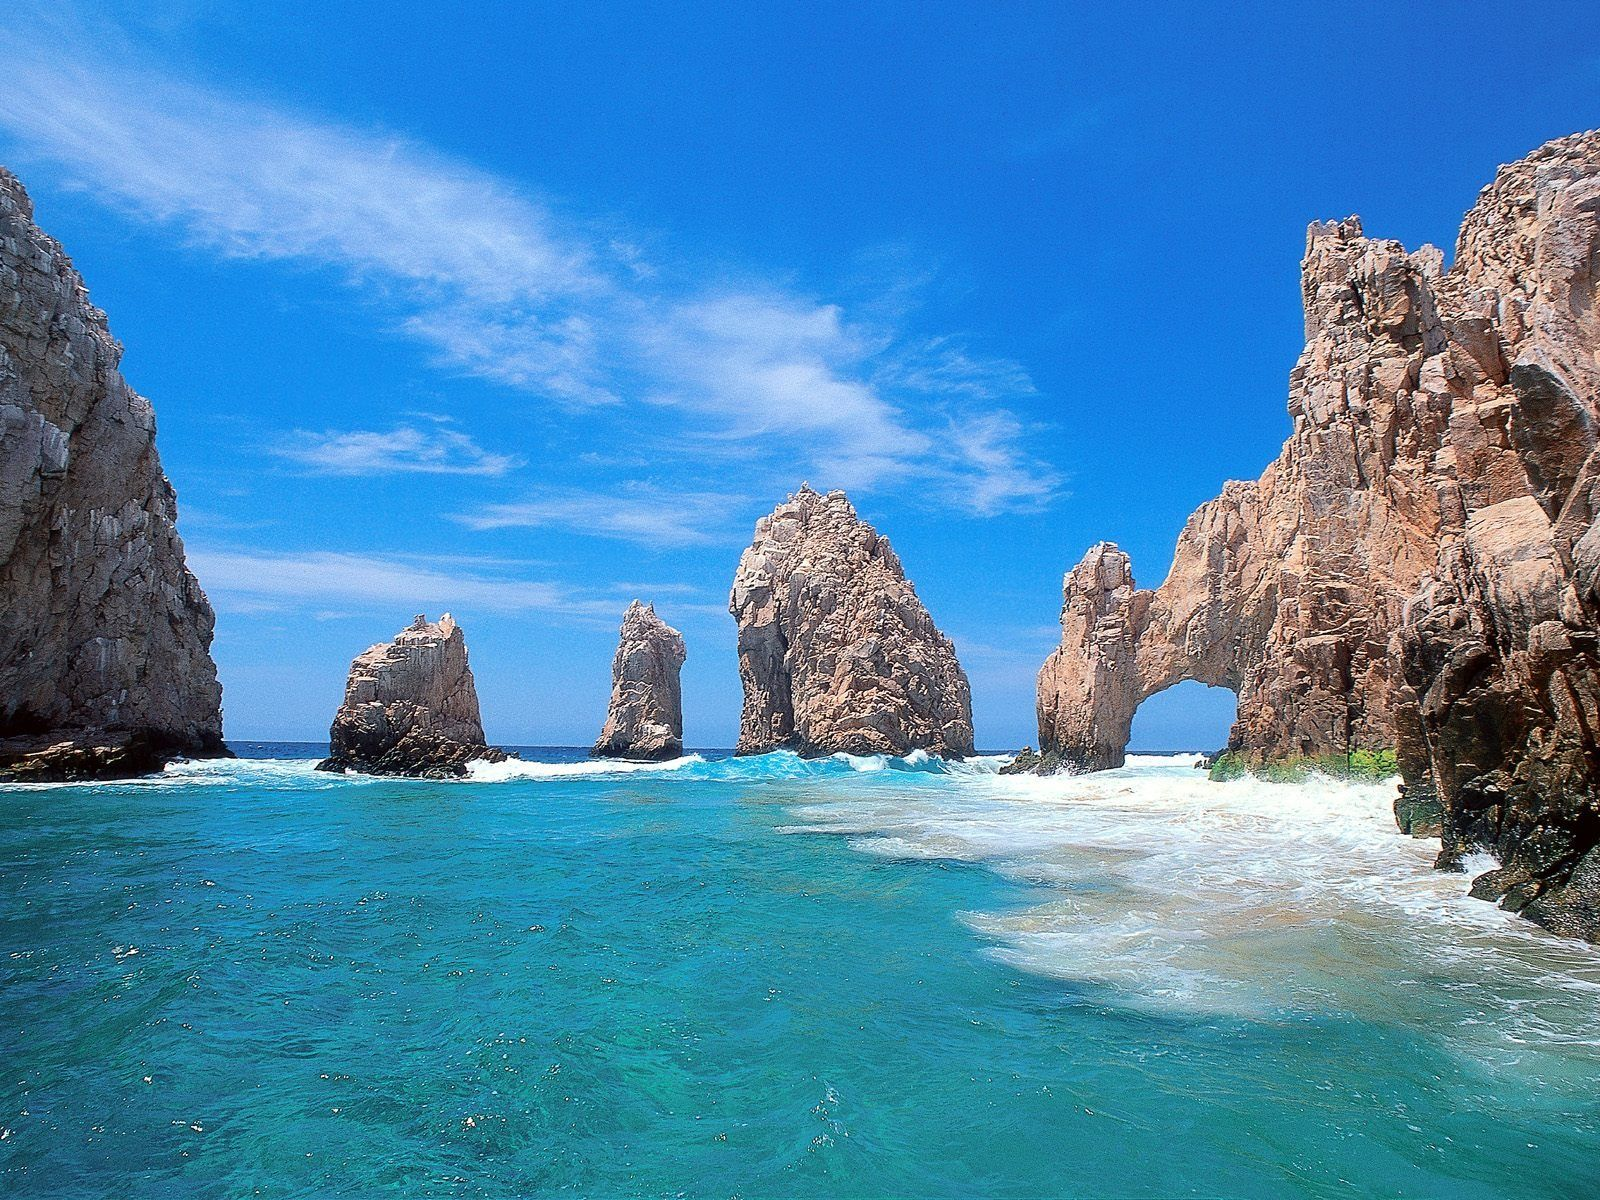 Cabo San Lucas, lovers island